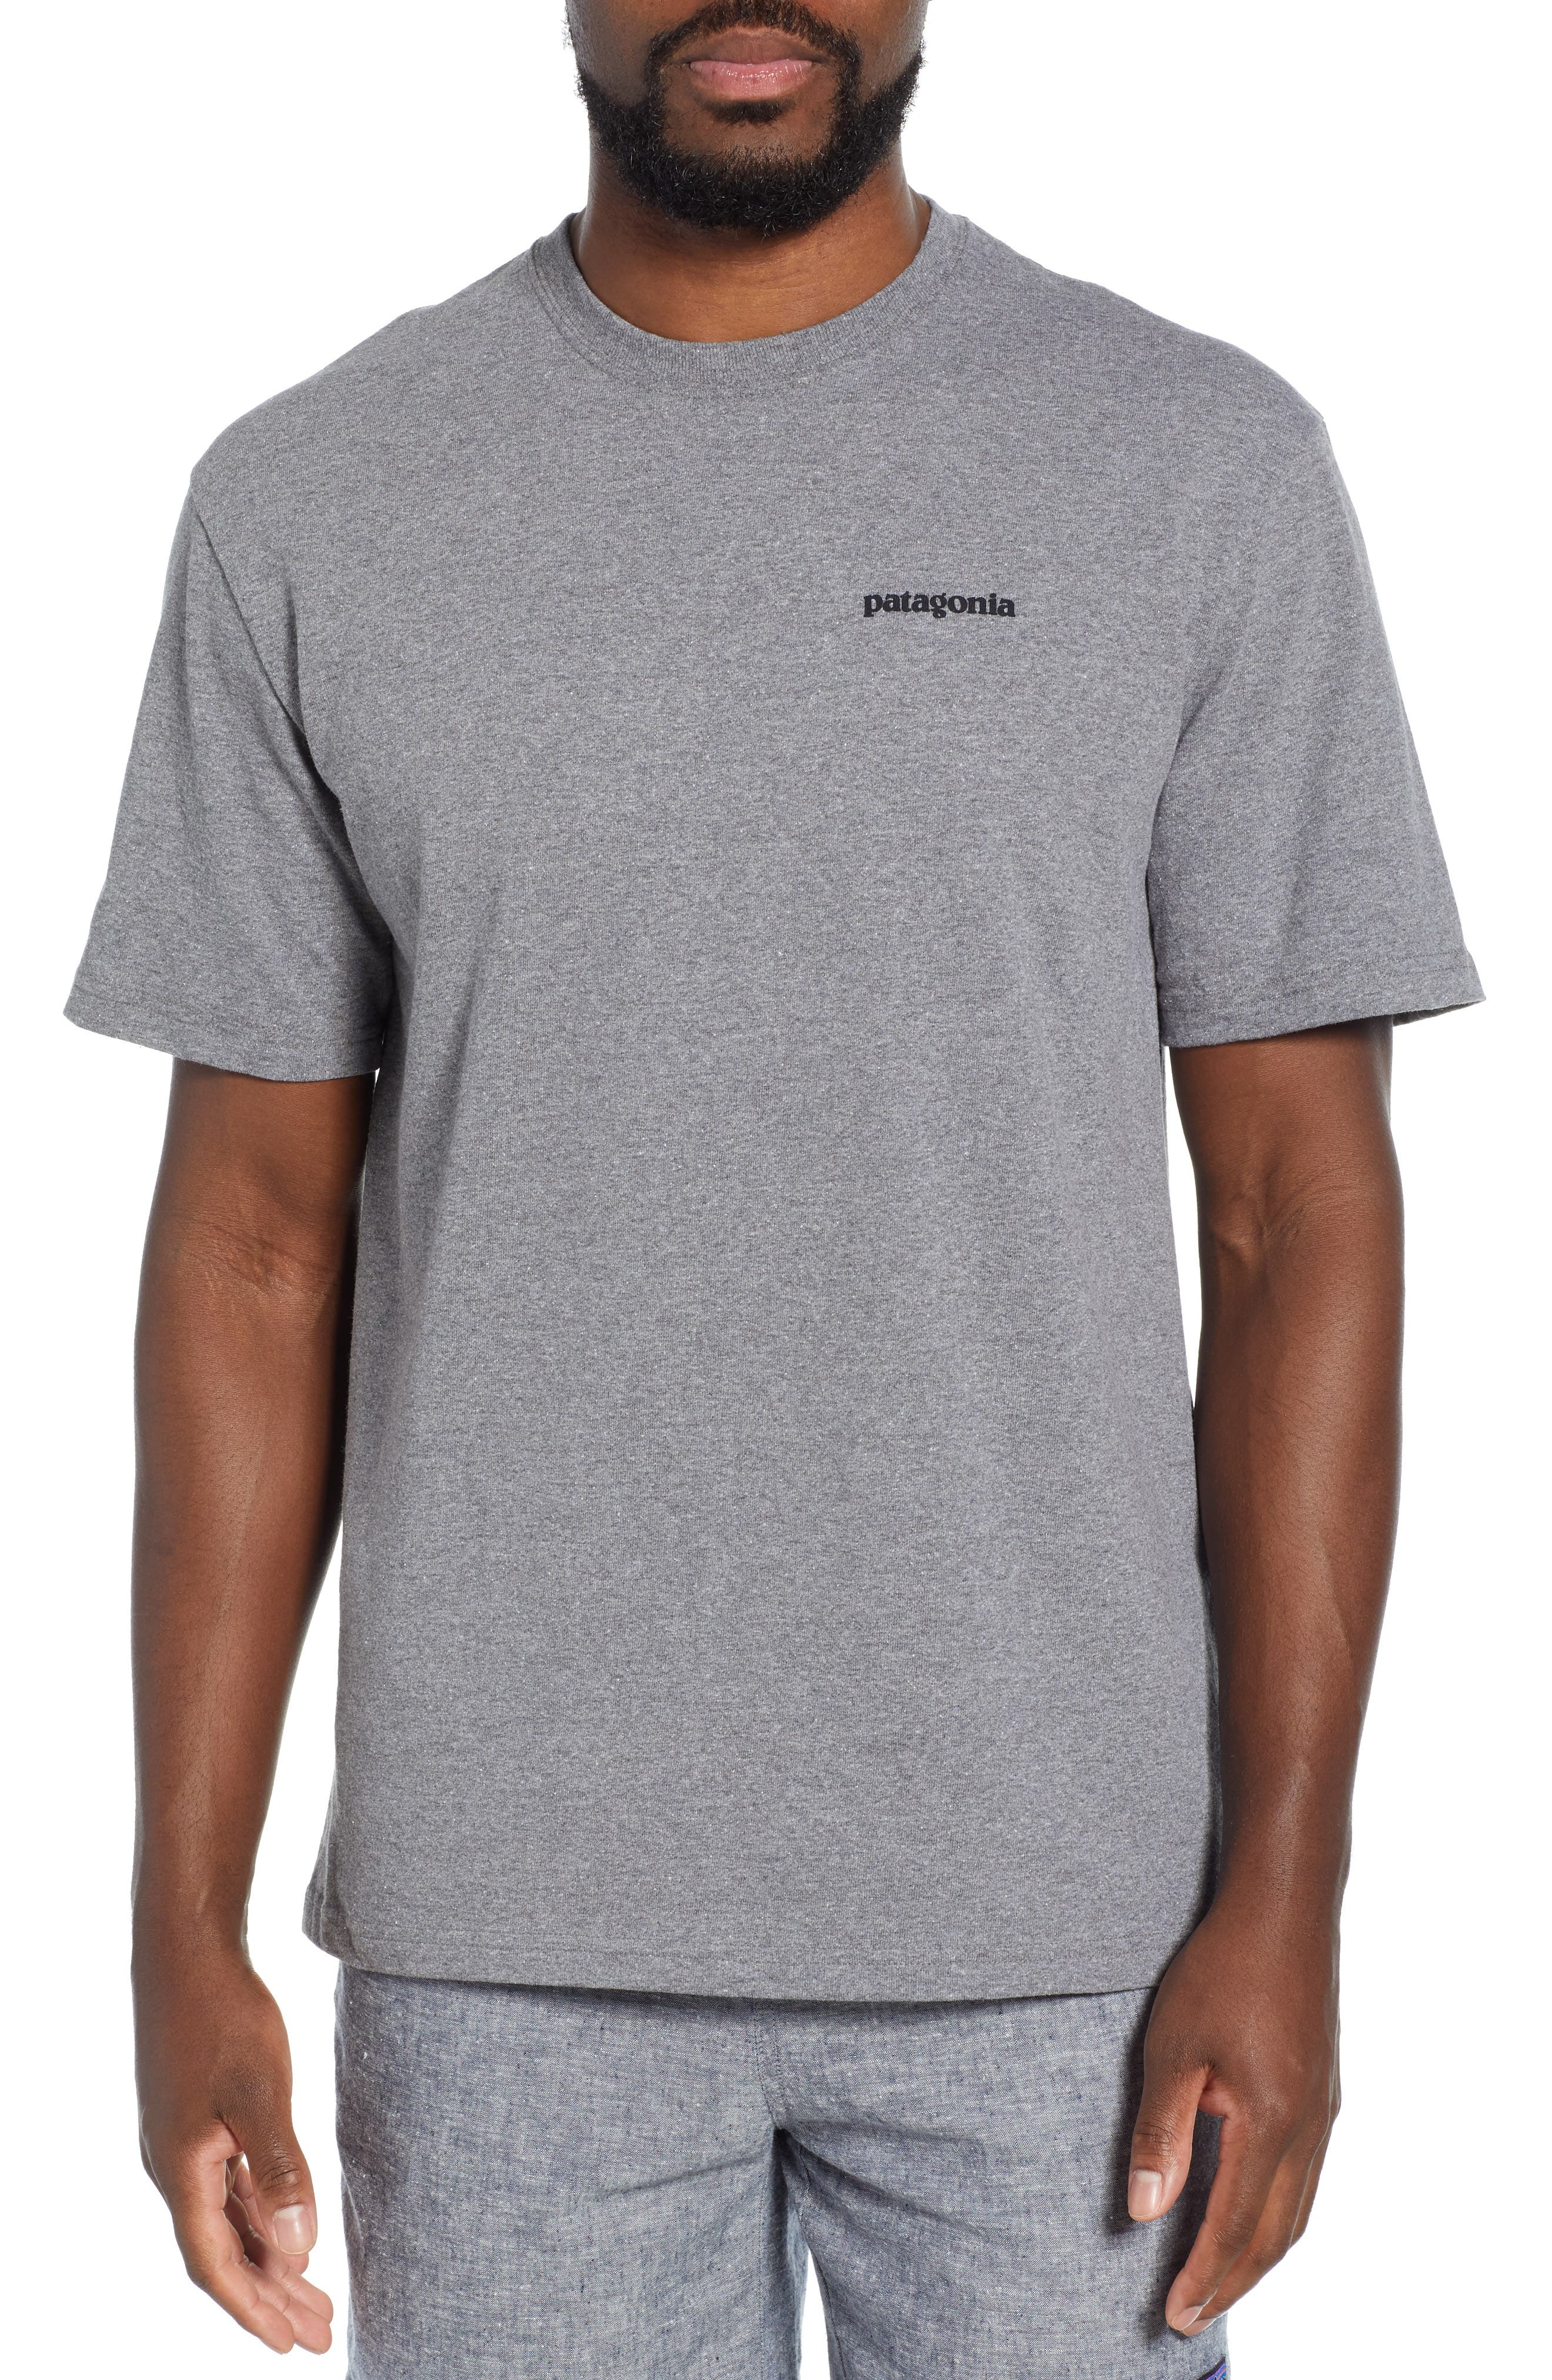 Fitz Roy Bison Responsibili-Tee T-Shirt, Main, color, GRAVEL HEATHER